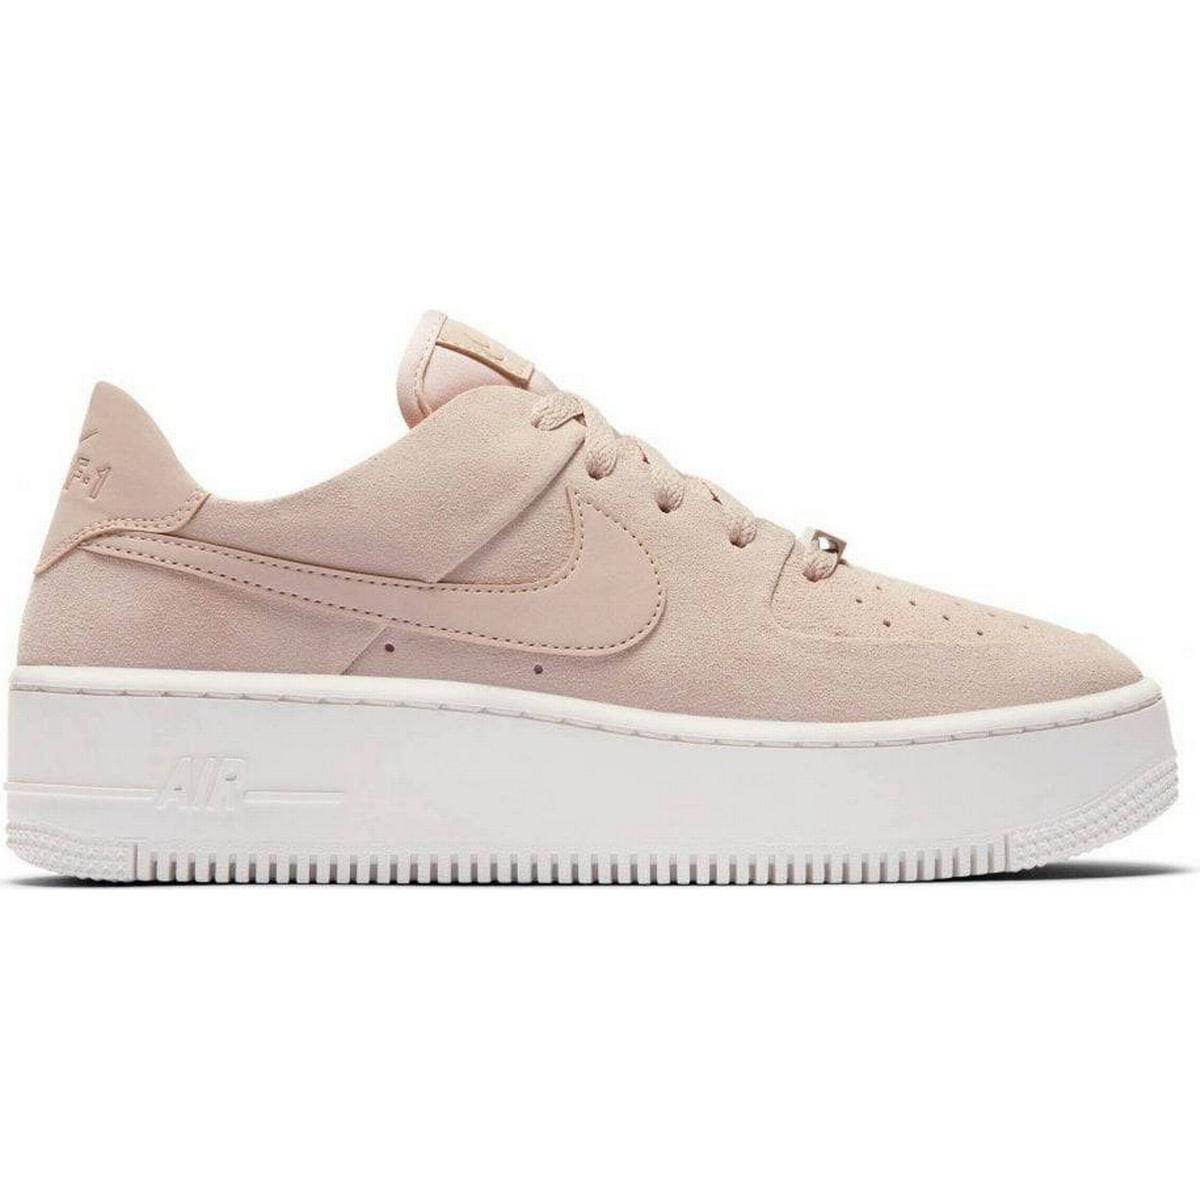 Nike af1 low • Hitta det lägsta priset hos PriceRunner nu »